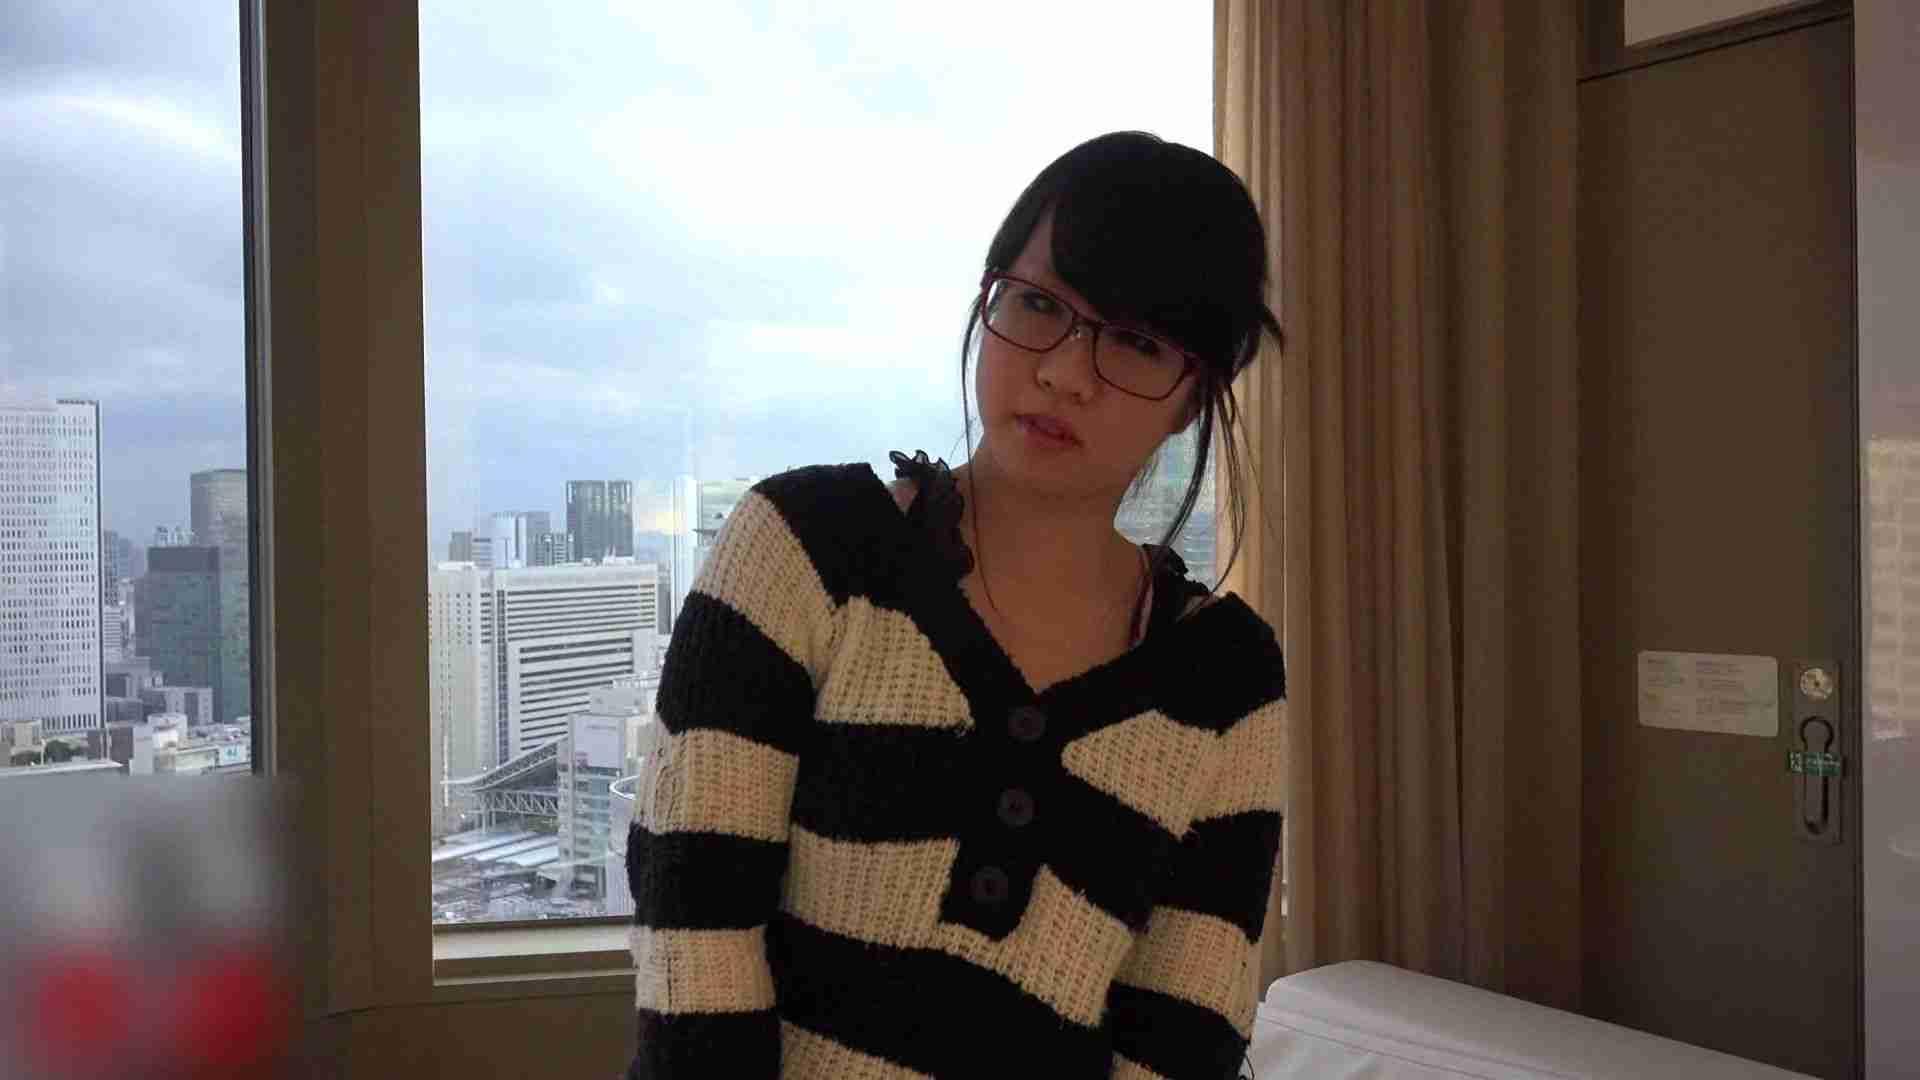 S級厳選美女ビッチガールVol.39 前編 0 | 0  112画像 58